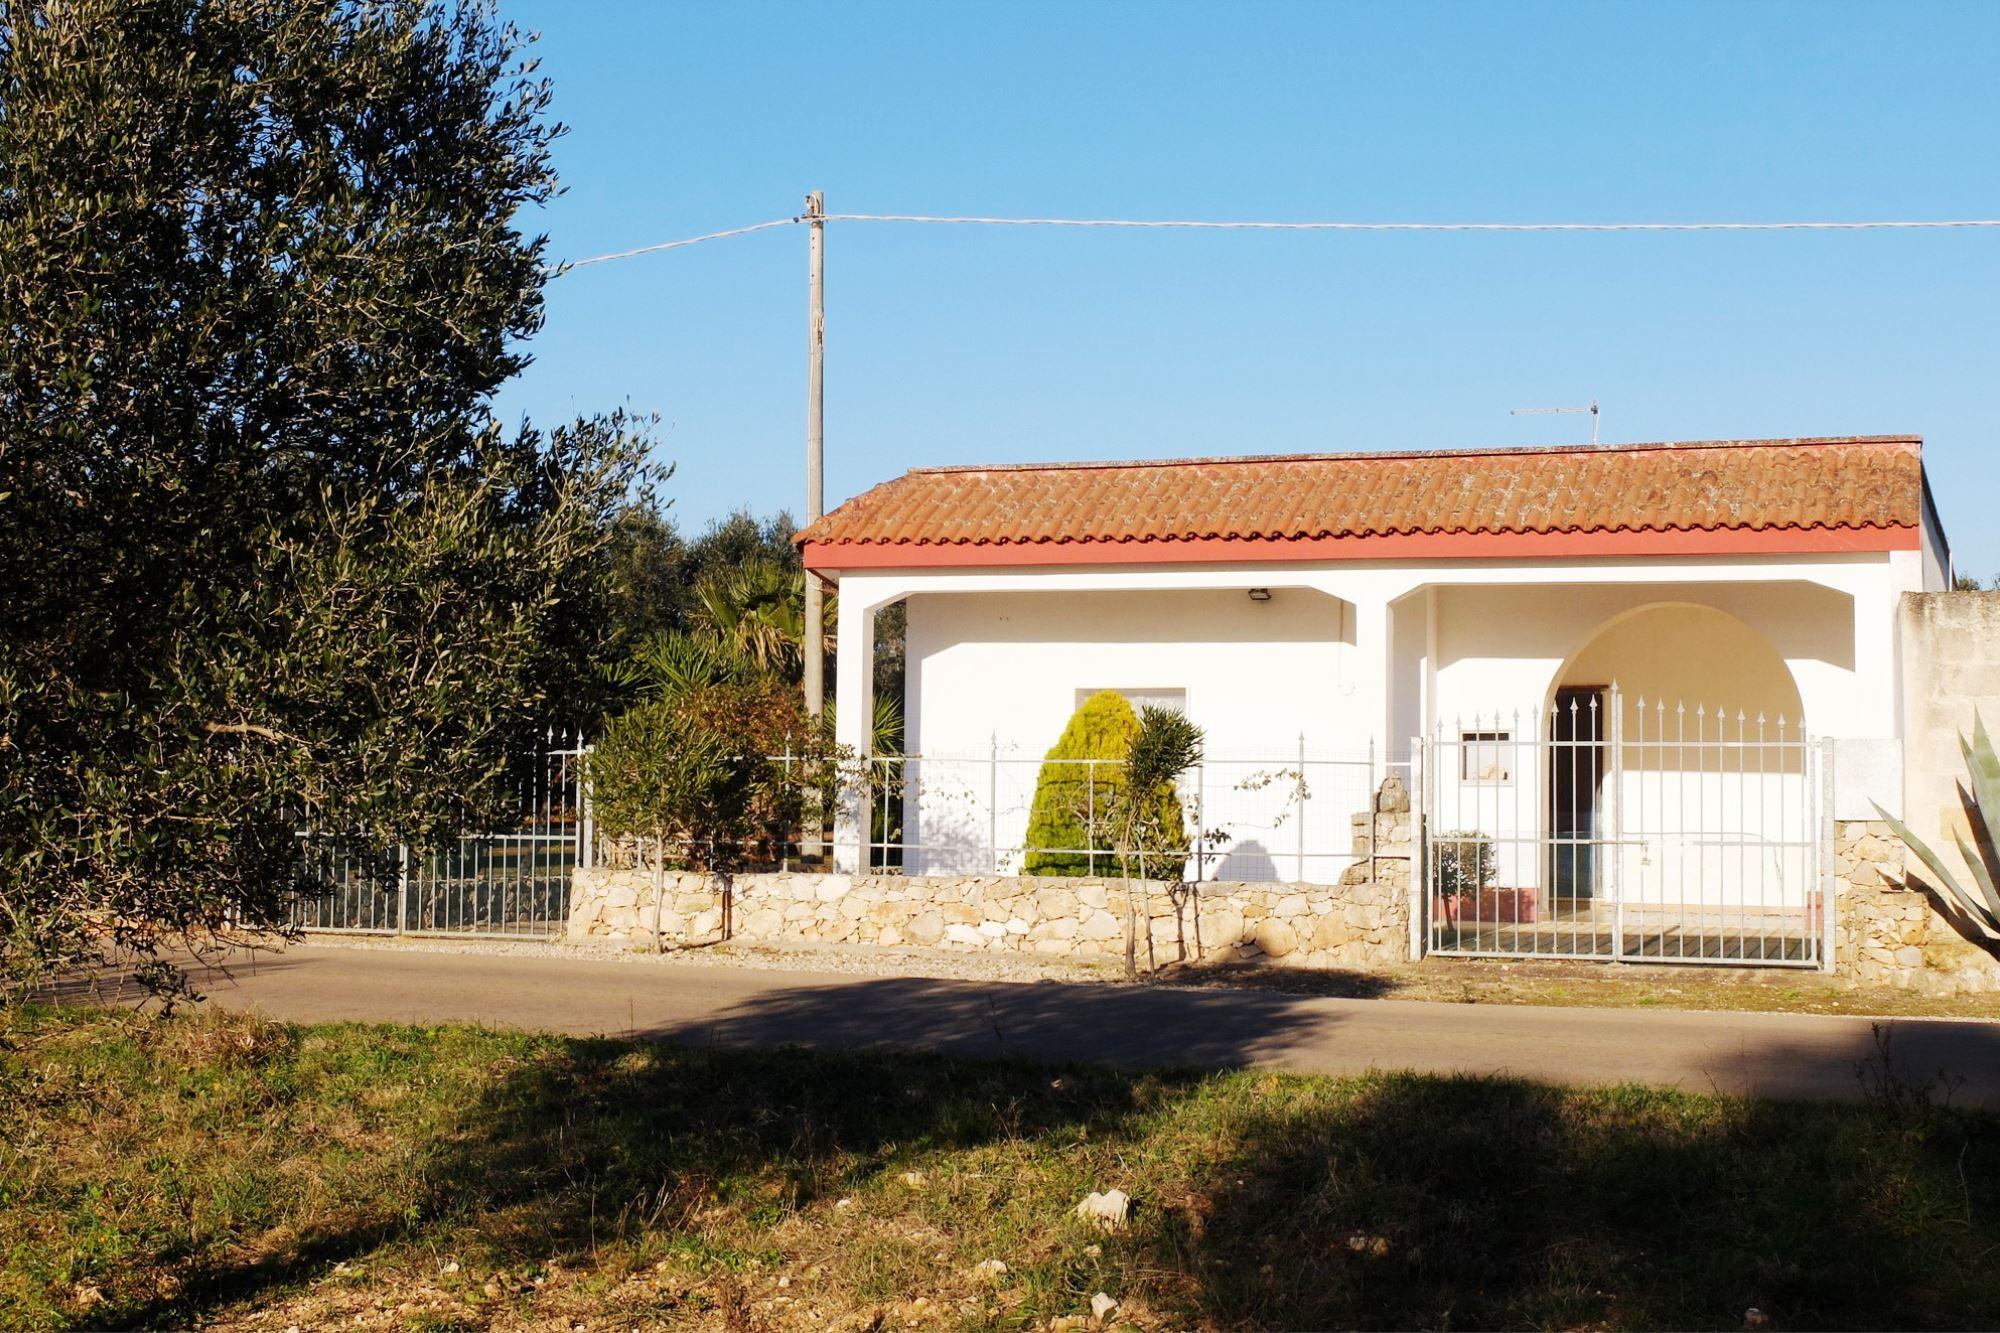 Santa Chiara Country House, a pochi km dal mare